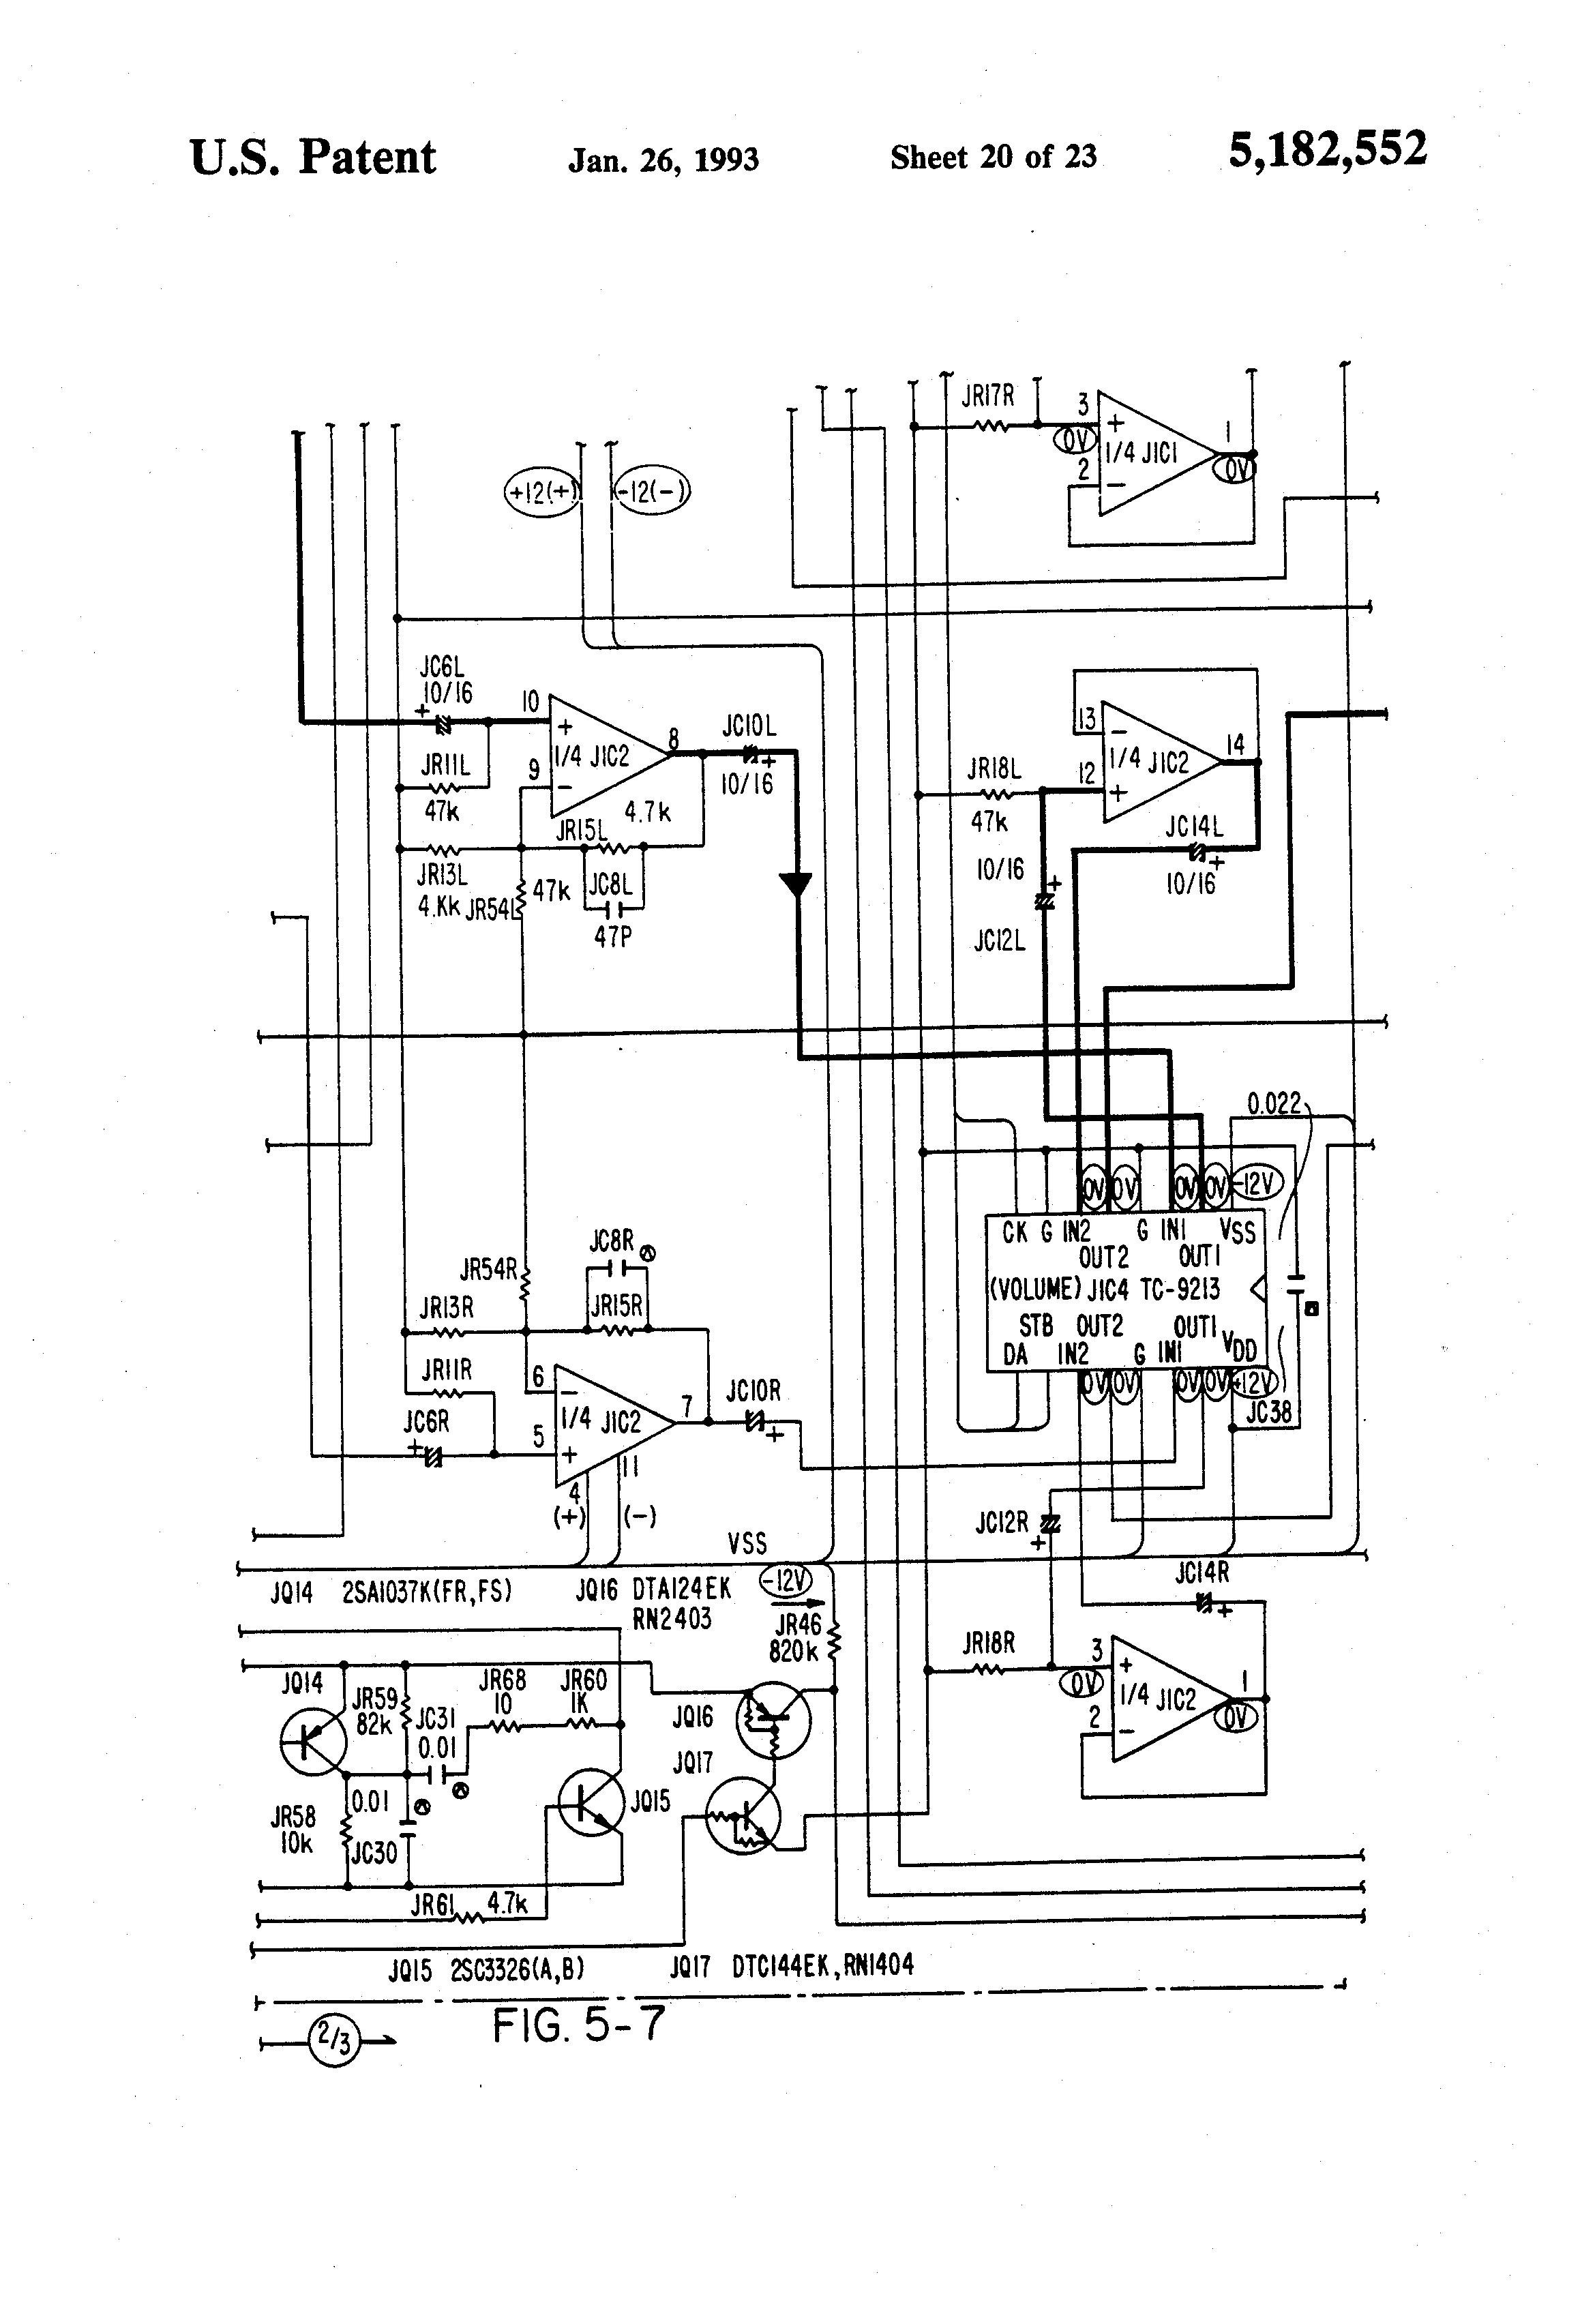 Acs295 Wiring Diagram - 95 Chevy Cavalier Fuse Box for Wiring Diagram  Schematics